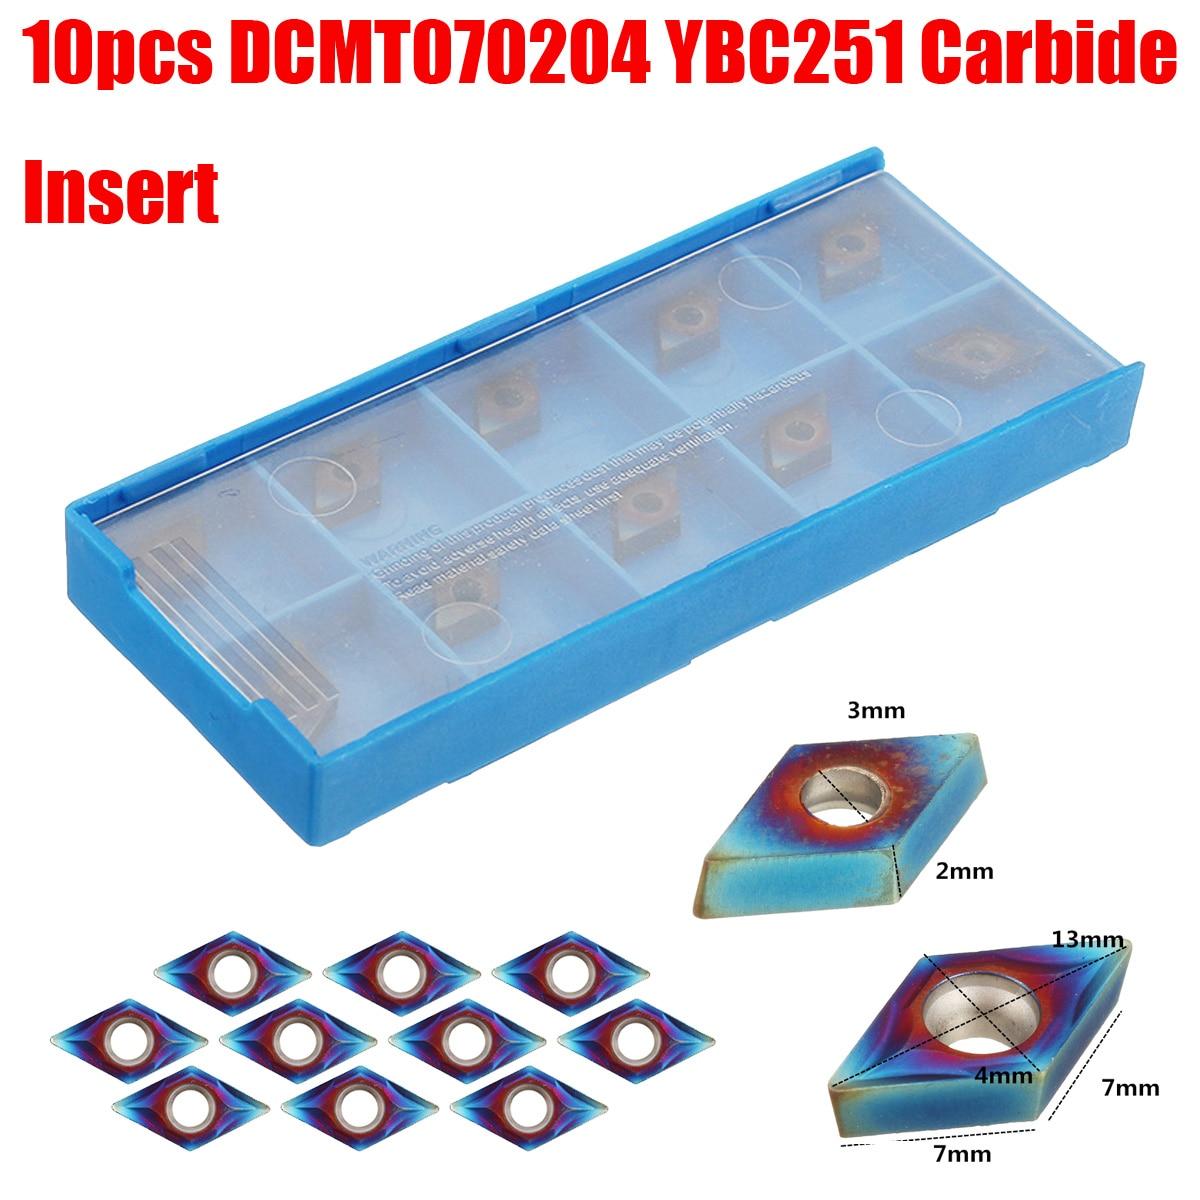 10pcs Blue Nano DCMT070204 Carbide Insert For SDNCN1010H07/SDNCN1212H07 Turning Tool Holder Set With Box